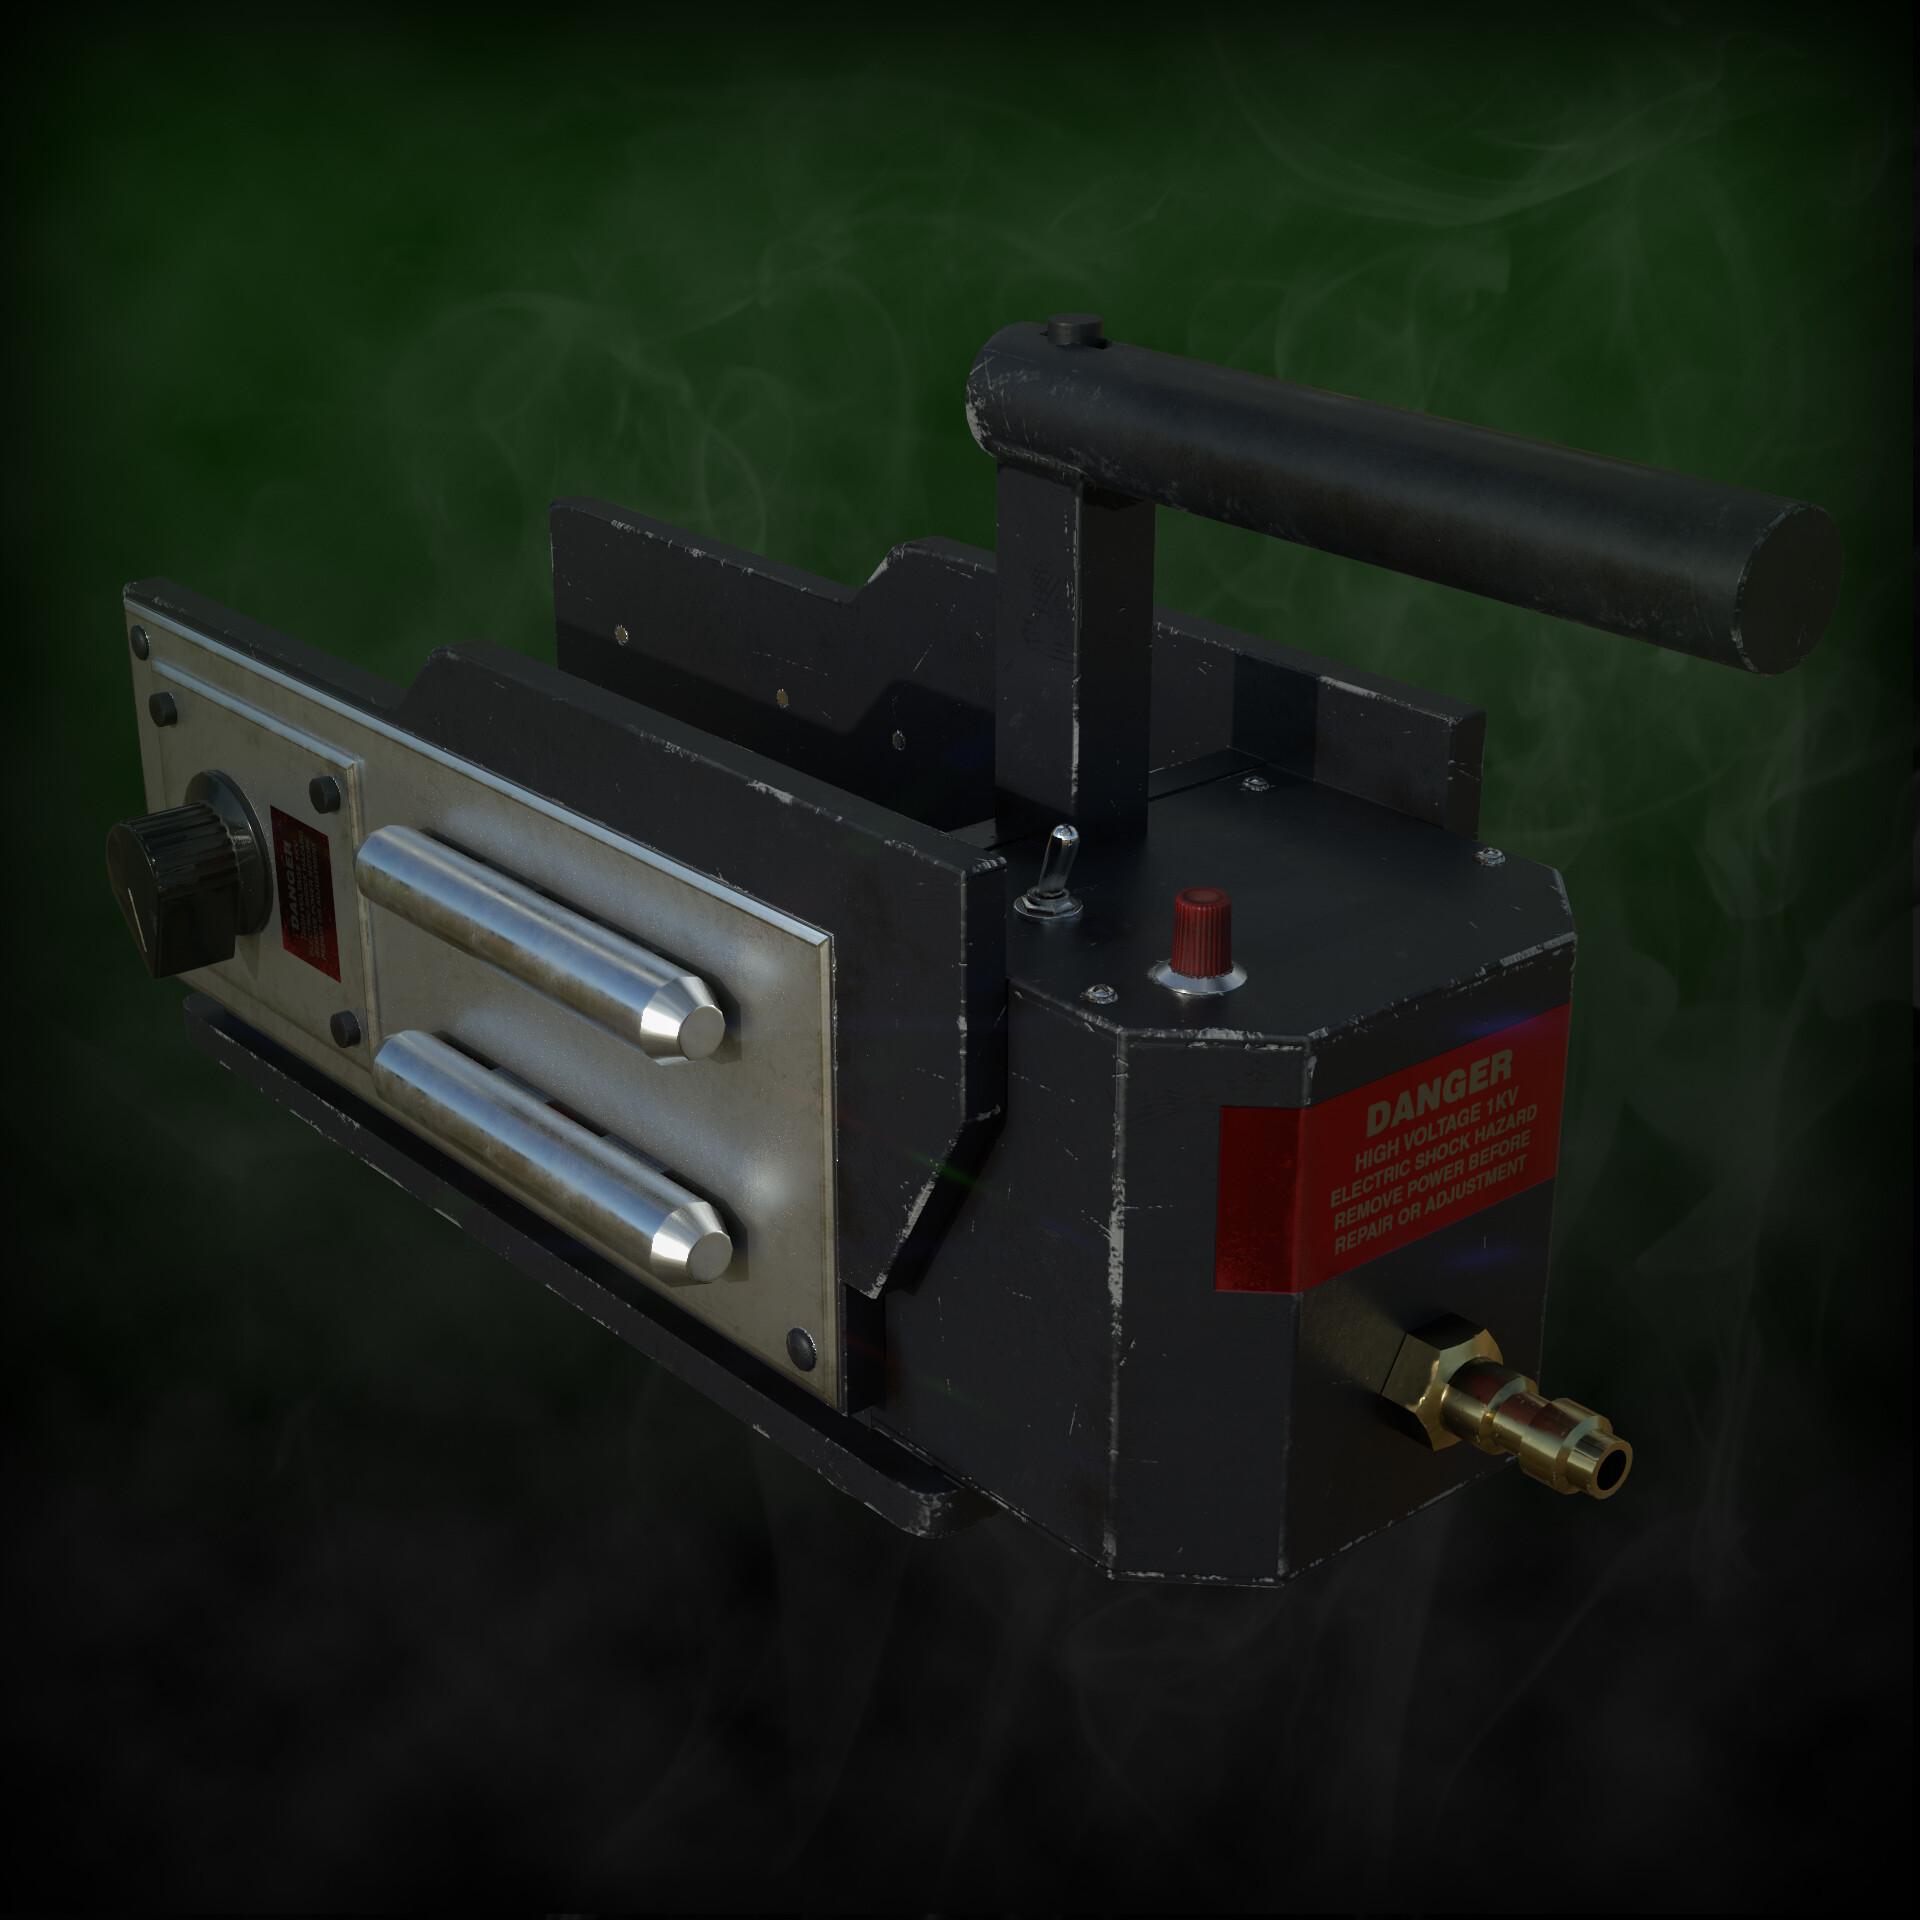 Thomas marrone ghostbusters trap wip 2019 07 14 03